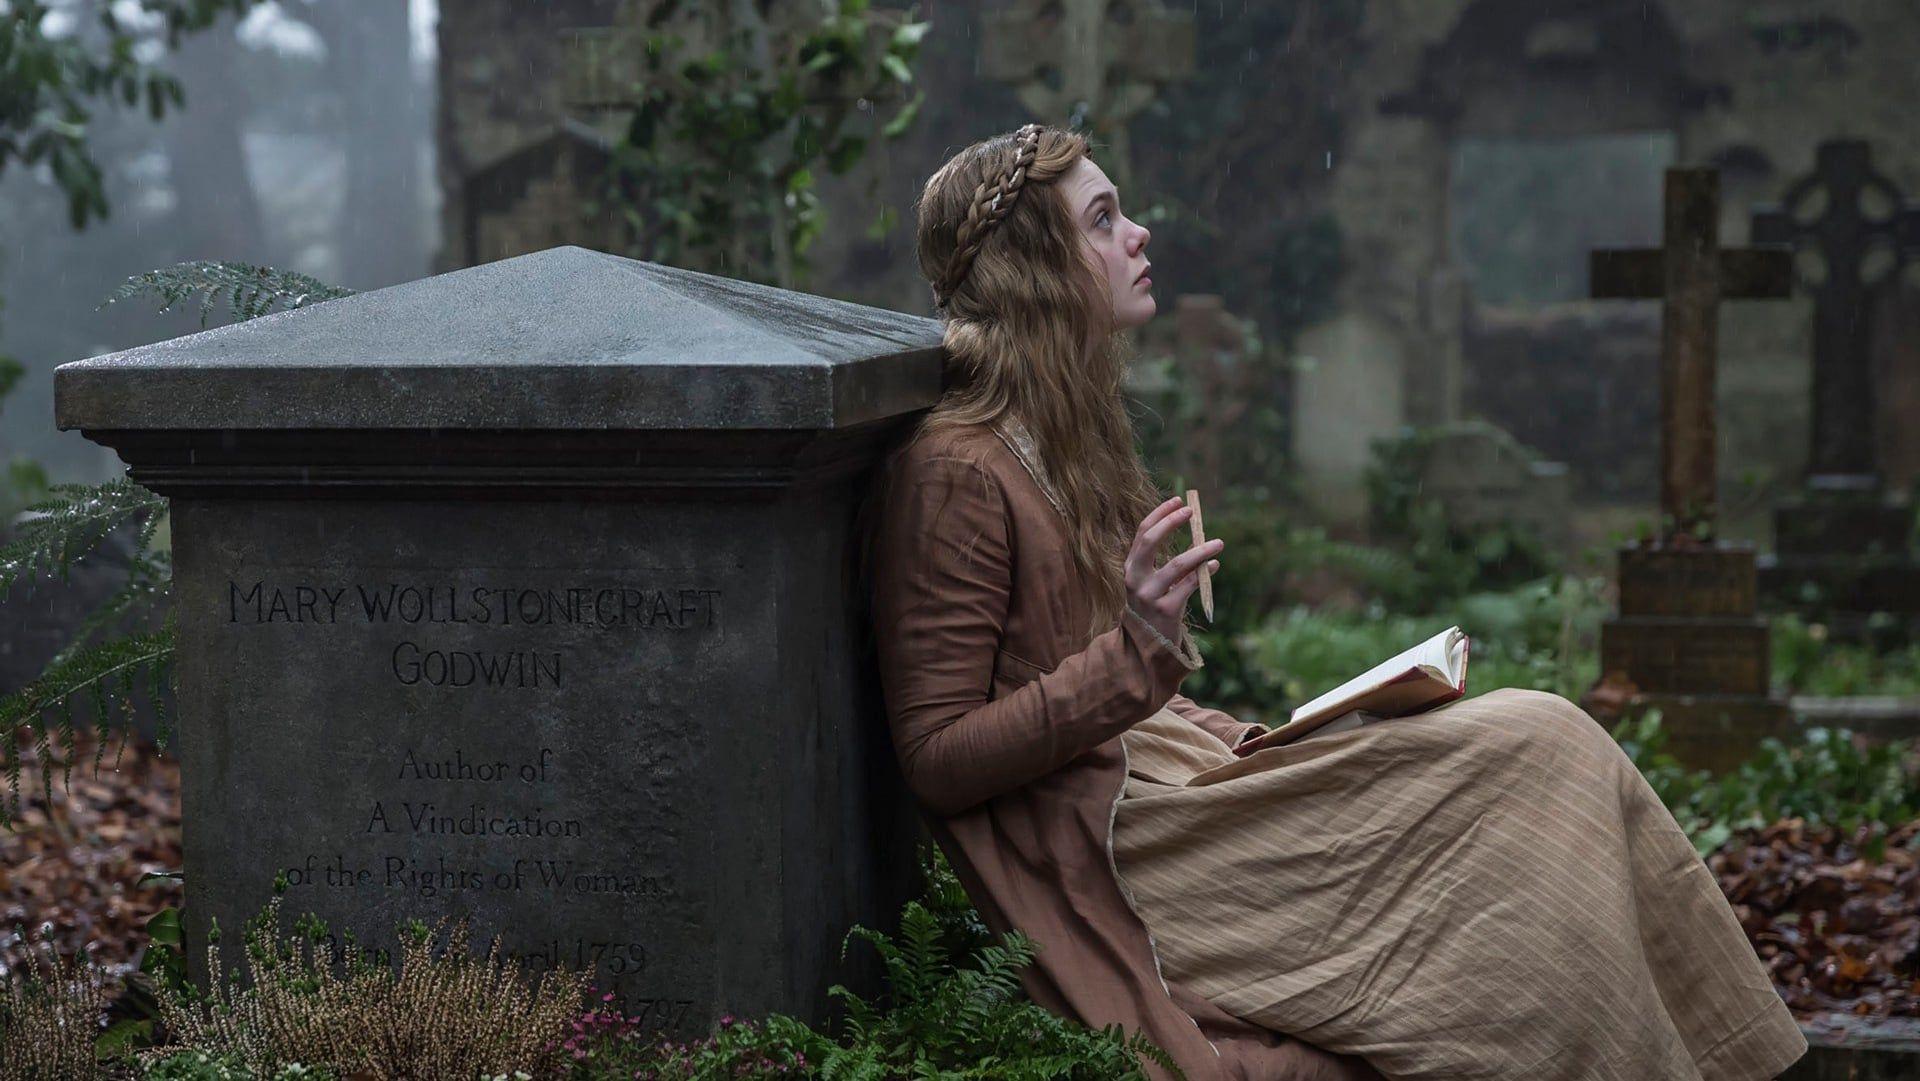 Mary Shelley 2018 fullmovie Hd Q 1080p English Subtitle Frankenstein Elle Fanning Film